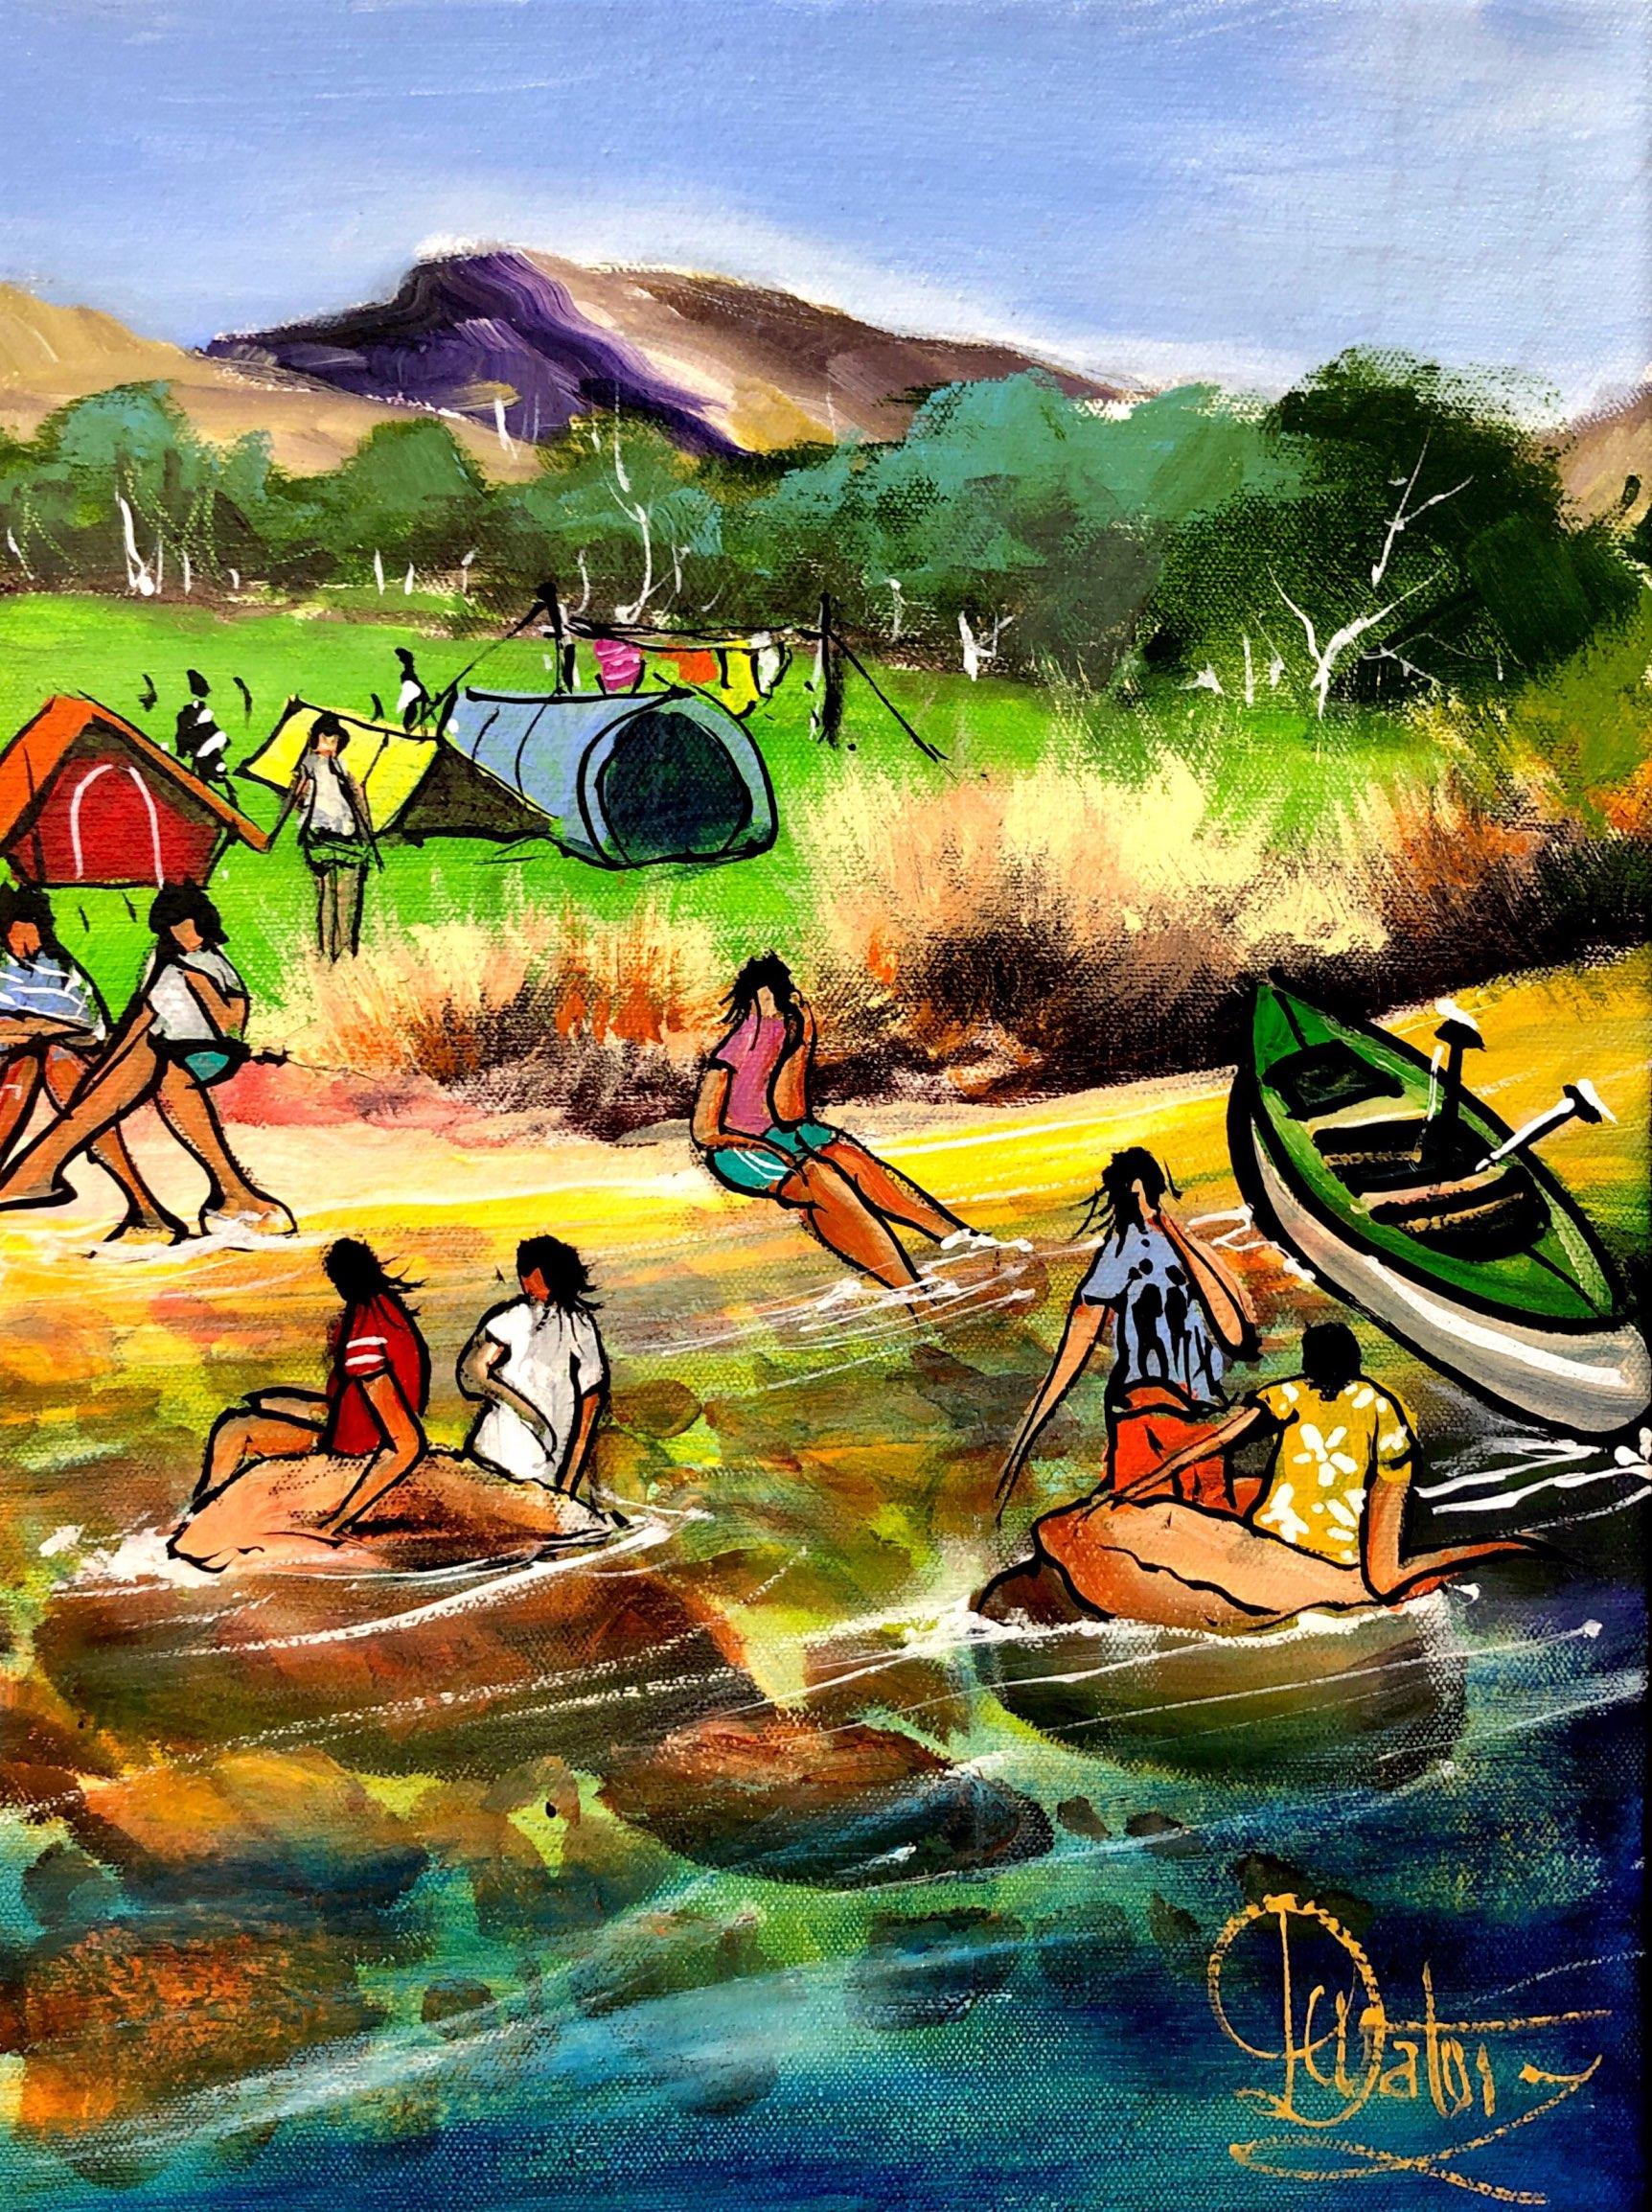 Camp Carry On II